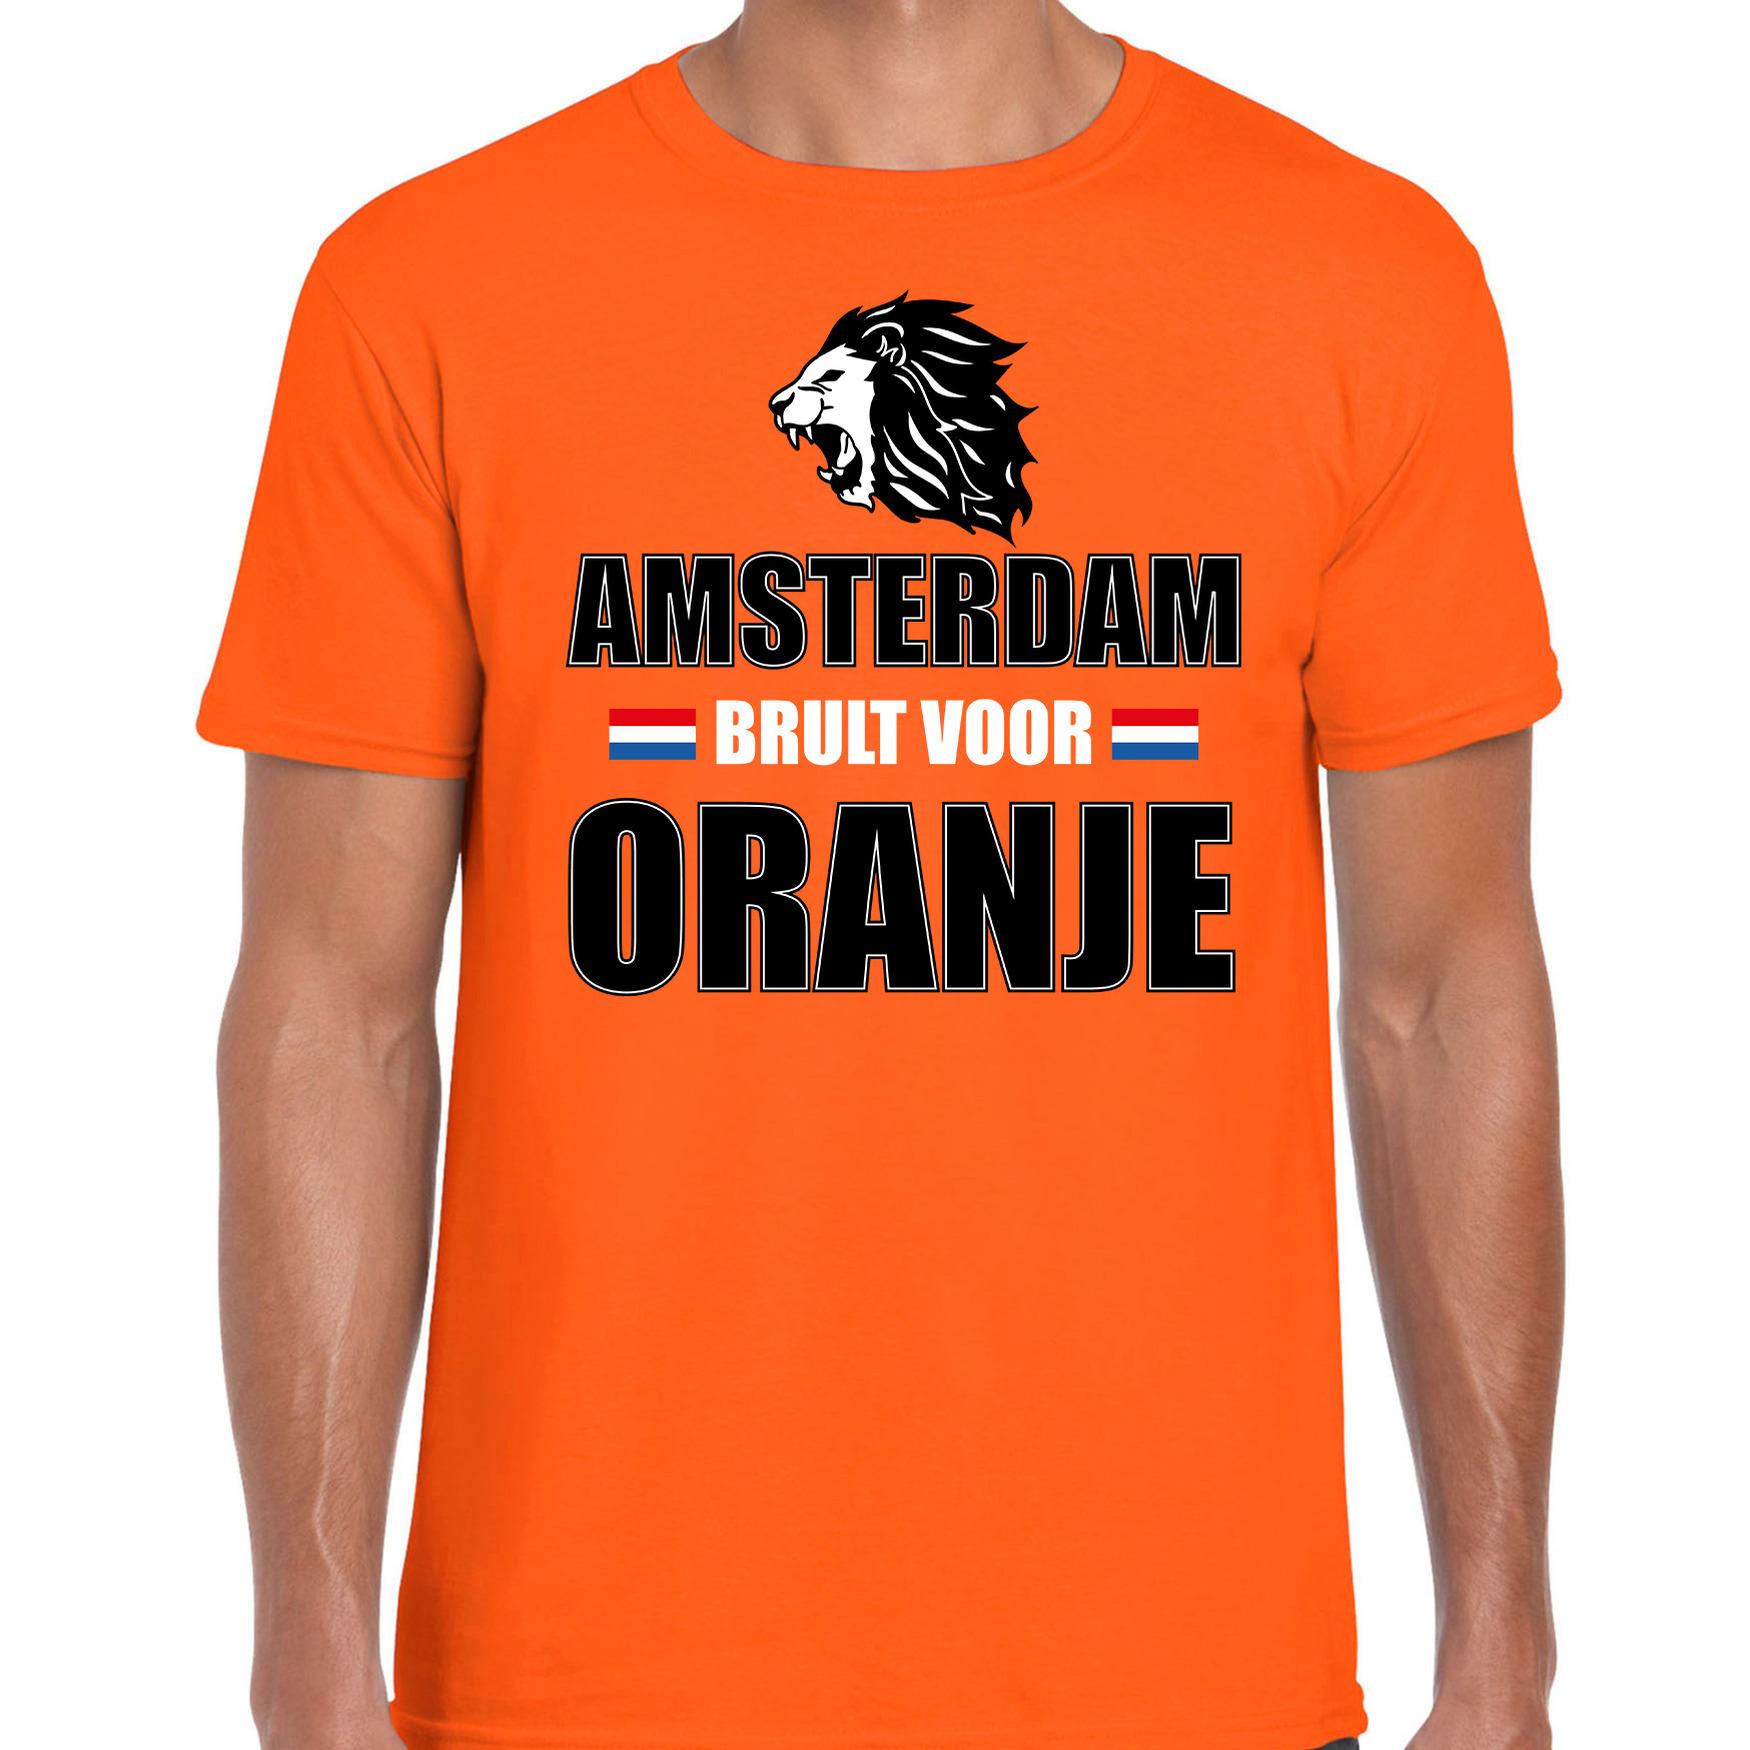 Oranje ek wk fan shirt kleding amsterdam brult voor oranje voor heren